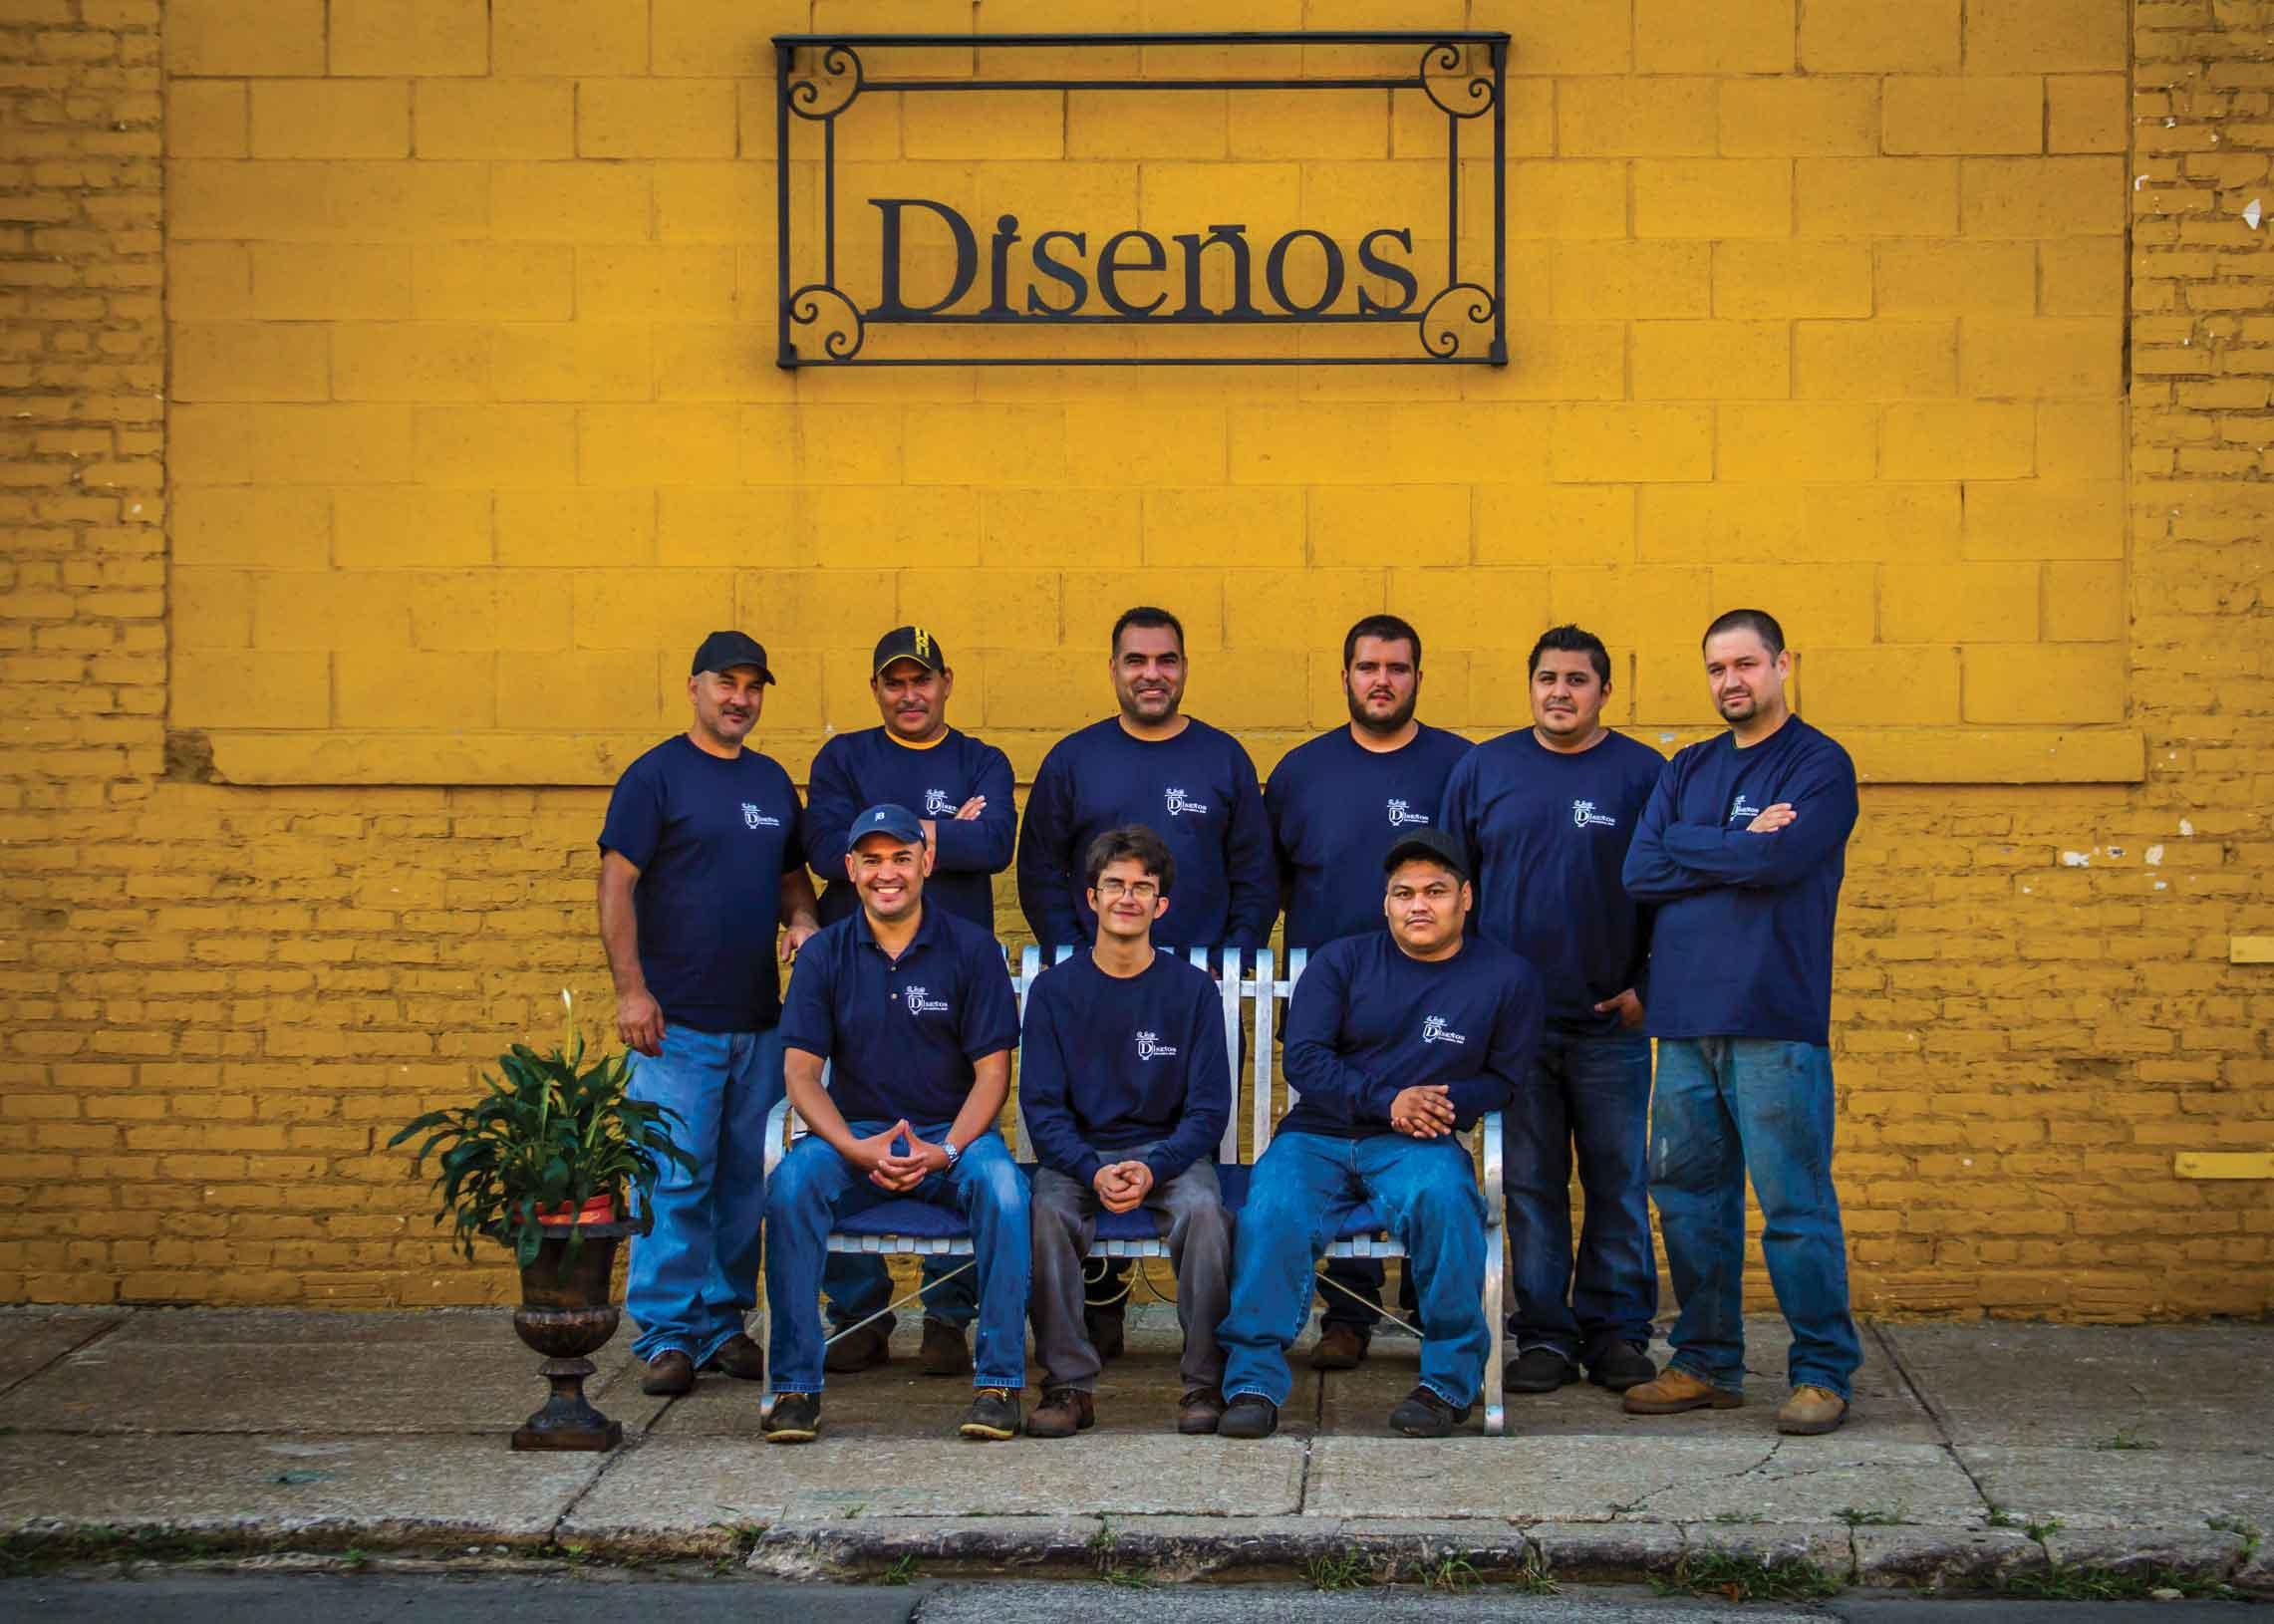 Diseños Ornamental Iron Detroit Staff Team